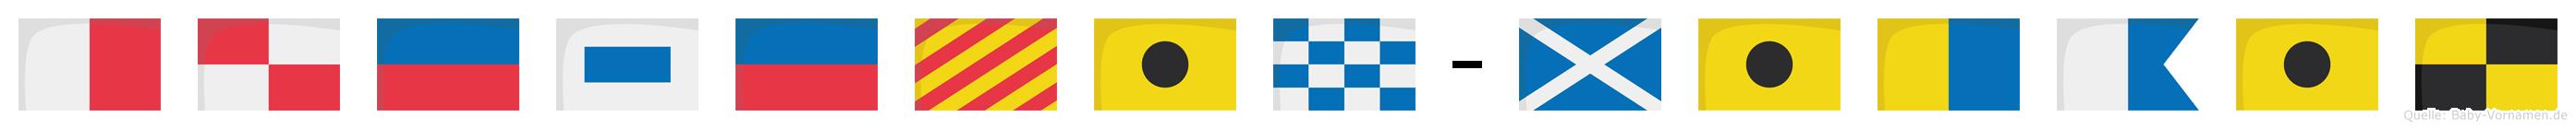 Hüseyin-Mikail im Flaggenalphabet